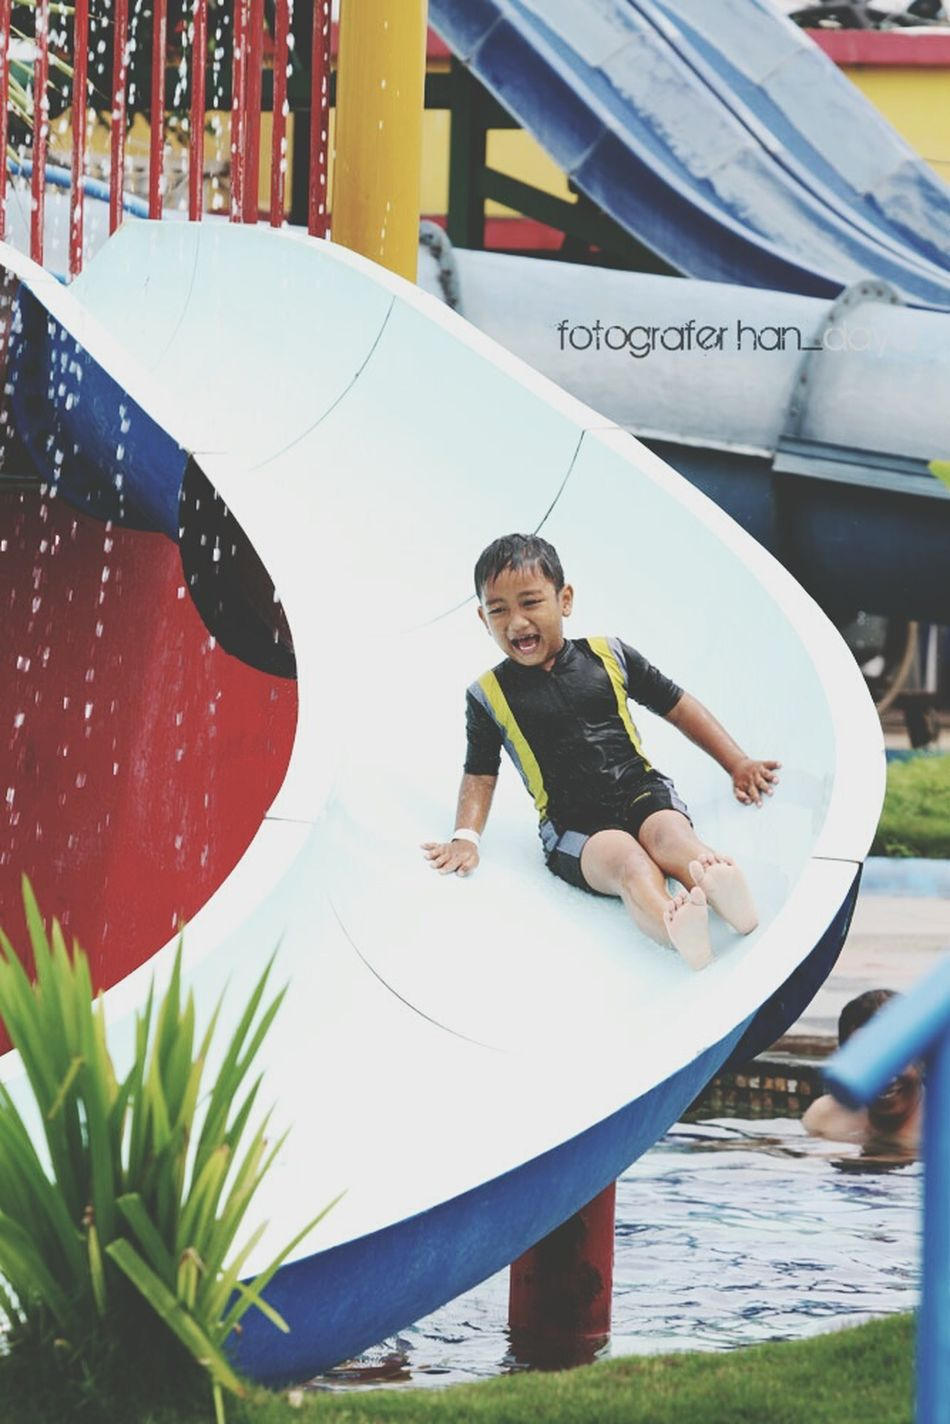 Funny Comel Waterboom Enjoying Life Hunting Photo Kids Have Fun HaveFun